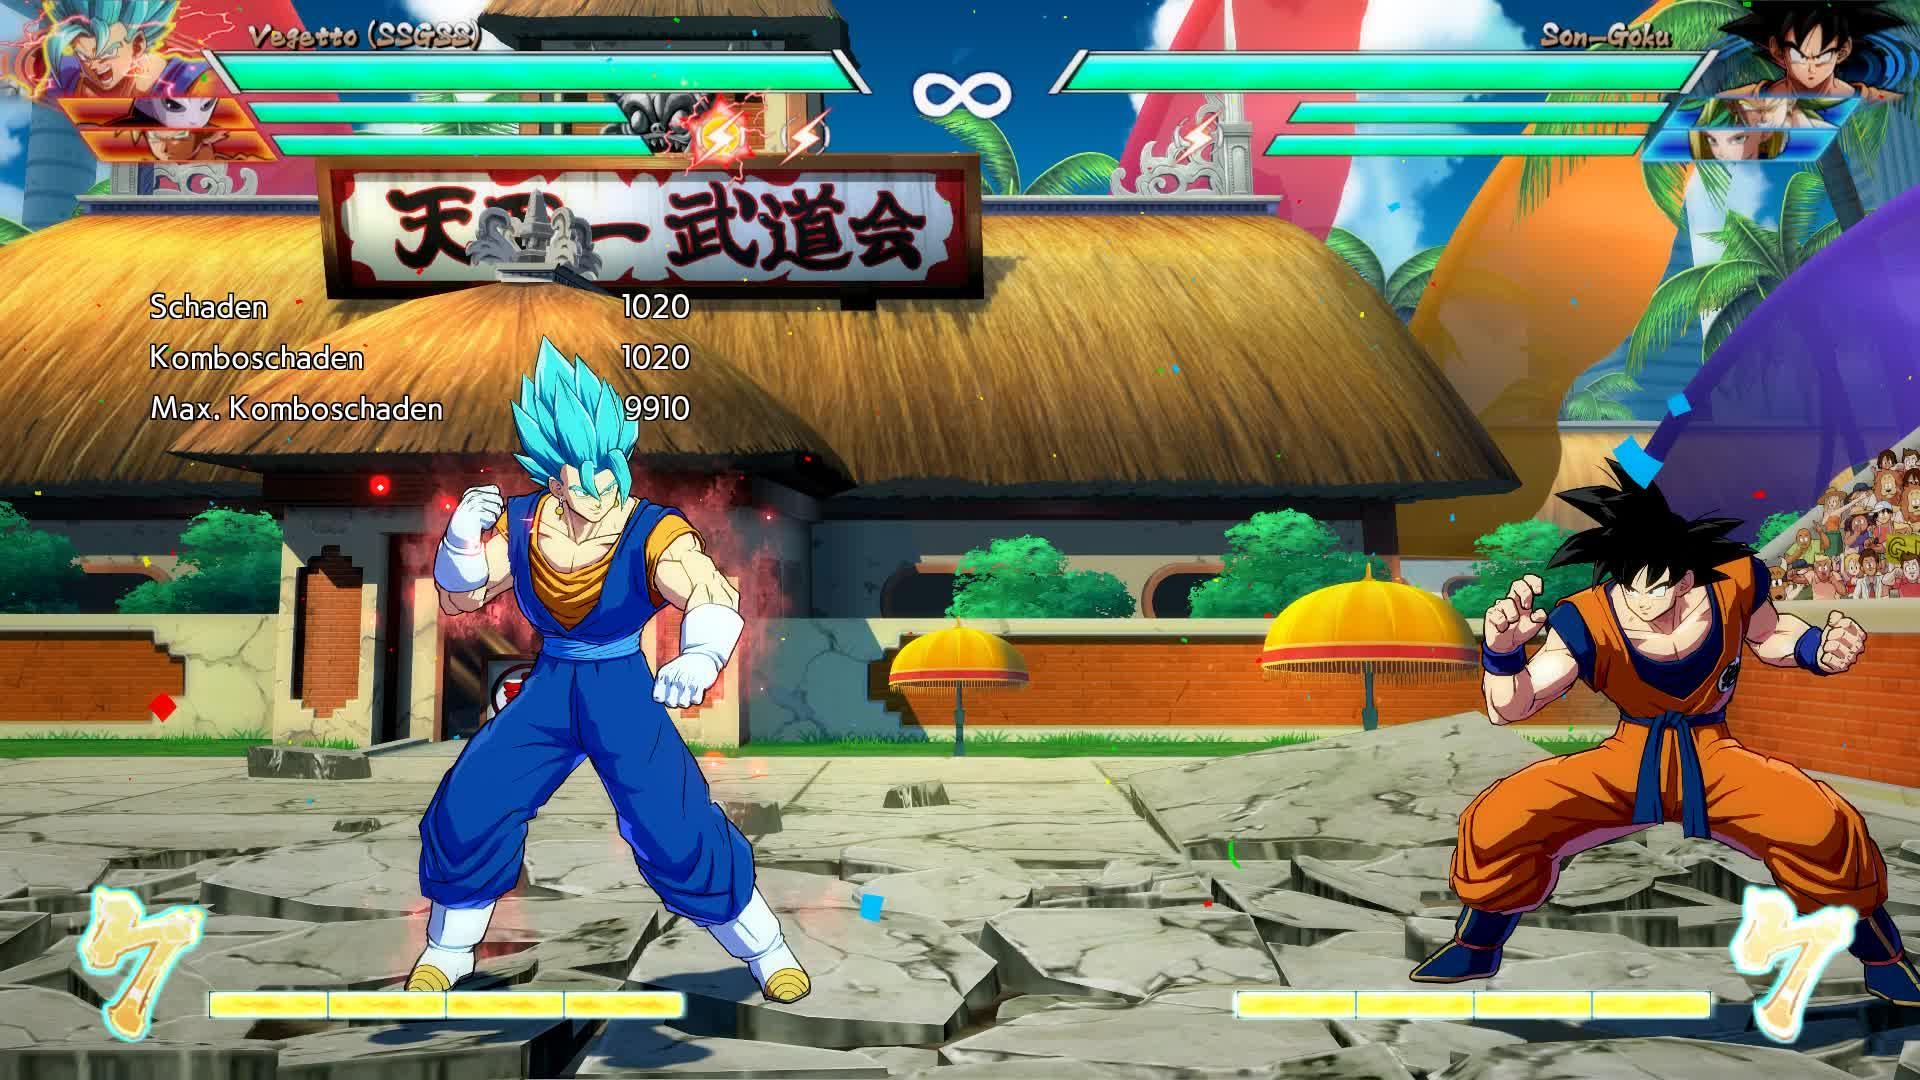 Dragon Ball FighterZ, dbfz, DRAGON BALL FighterZ 2019.04.23 - 15.32.48.02 GIFs